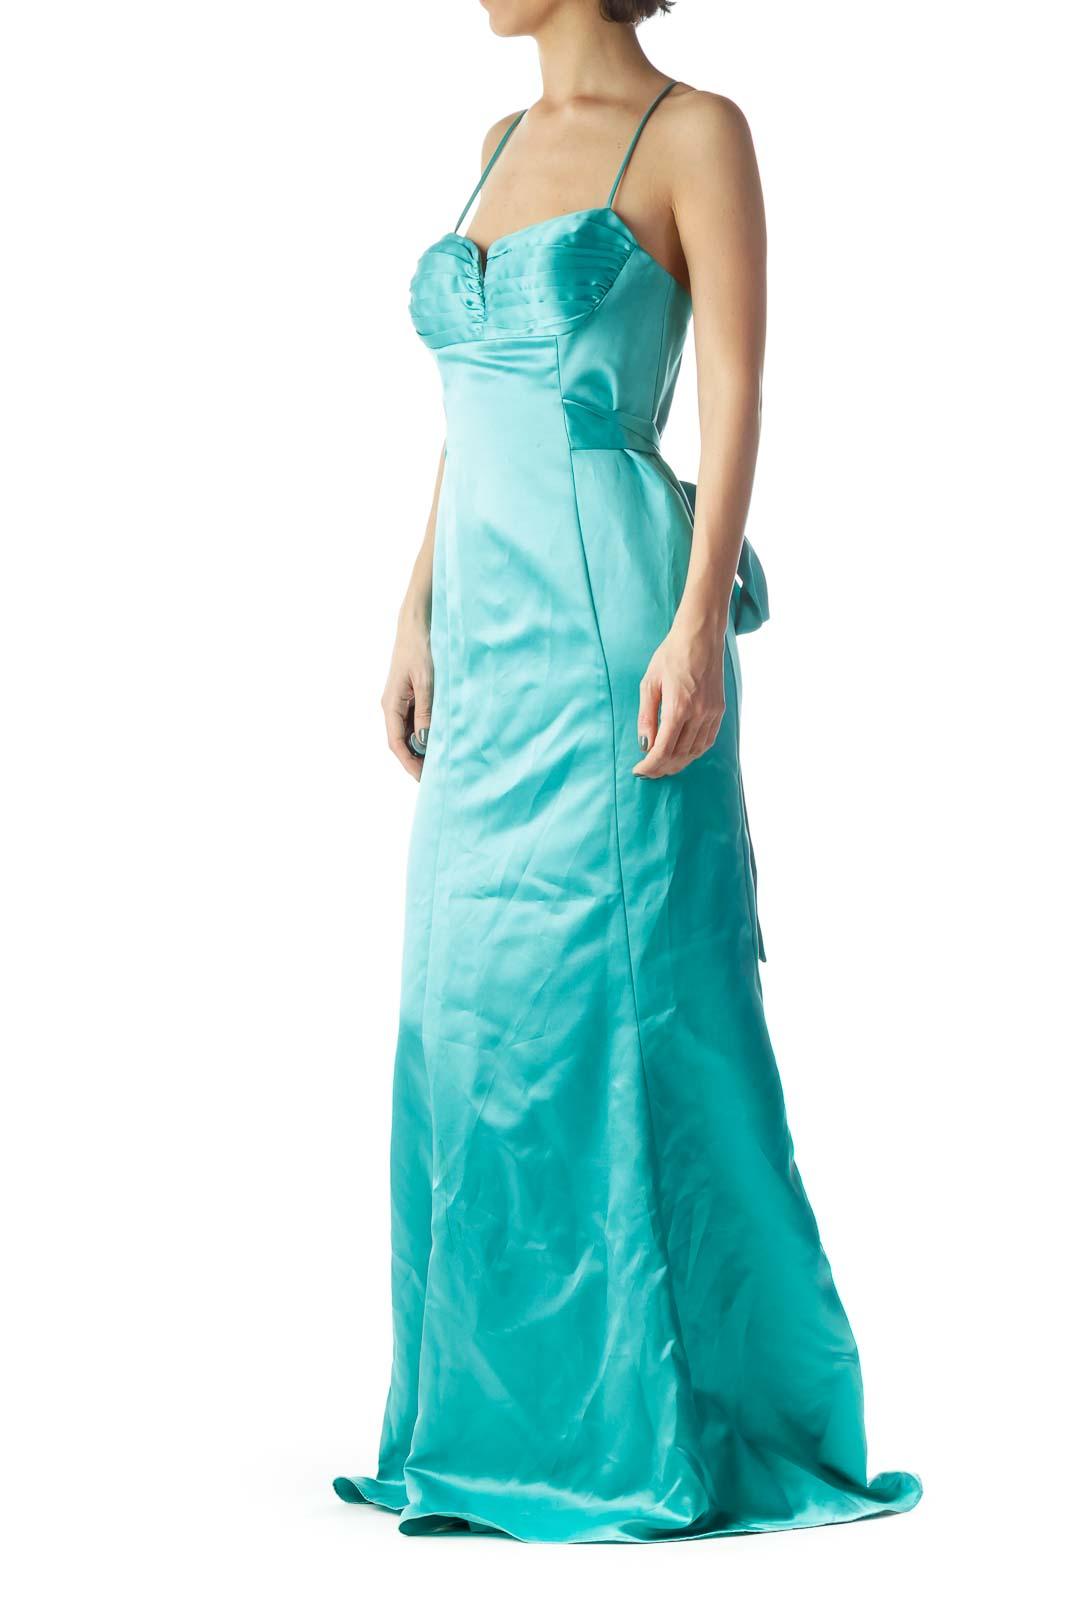 Teal Blue Sweetheart Neck Spaghetti Strap Dress